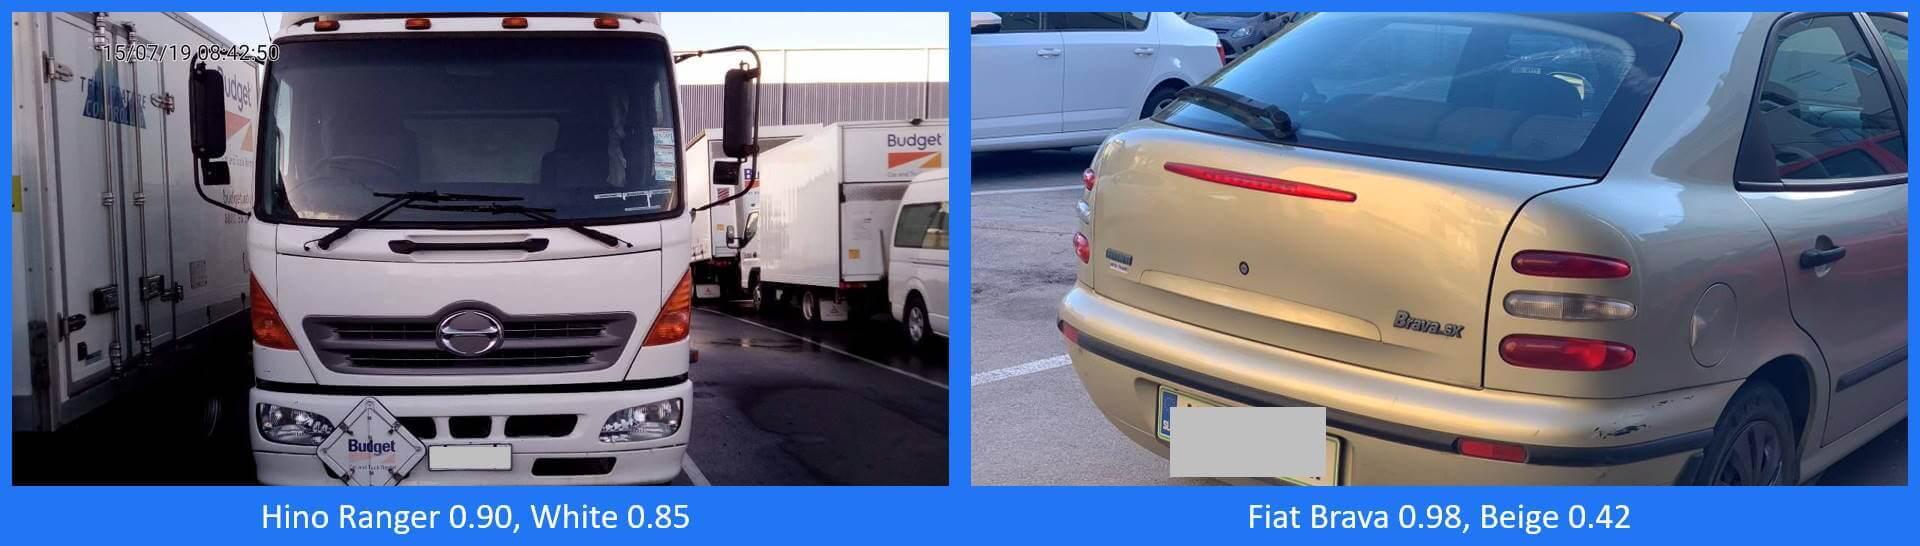 Vehicle MMR Example